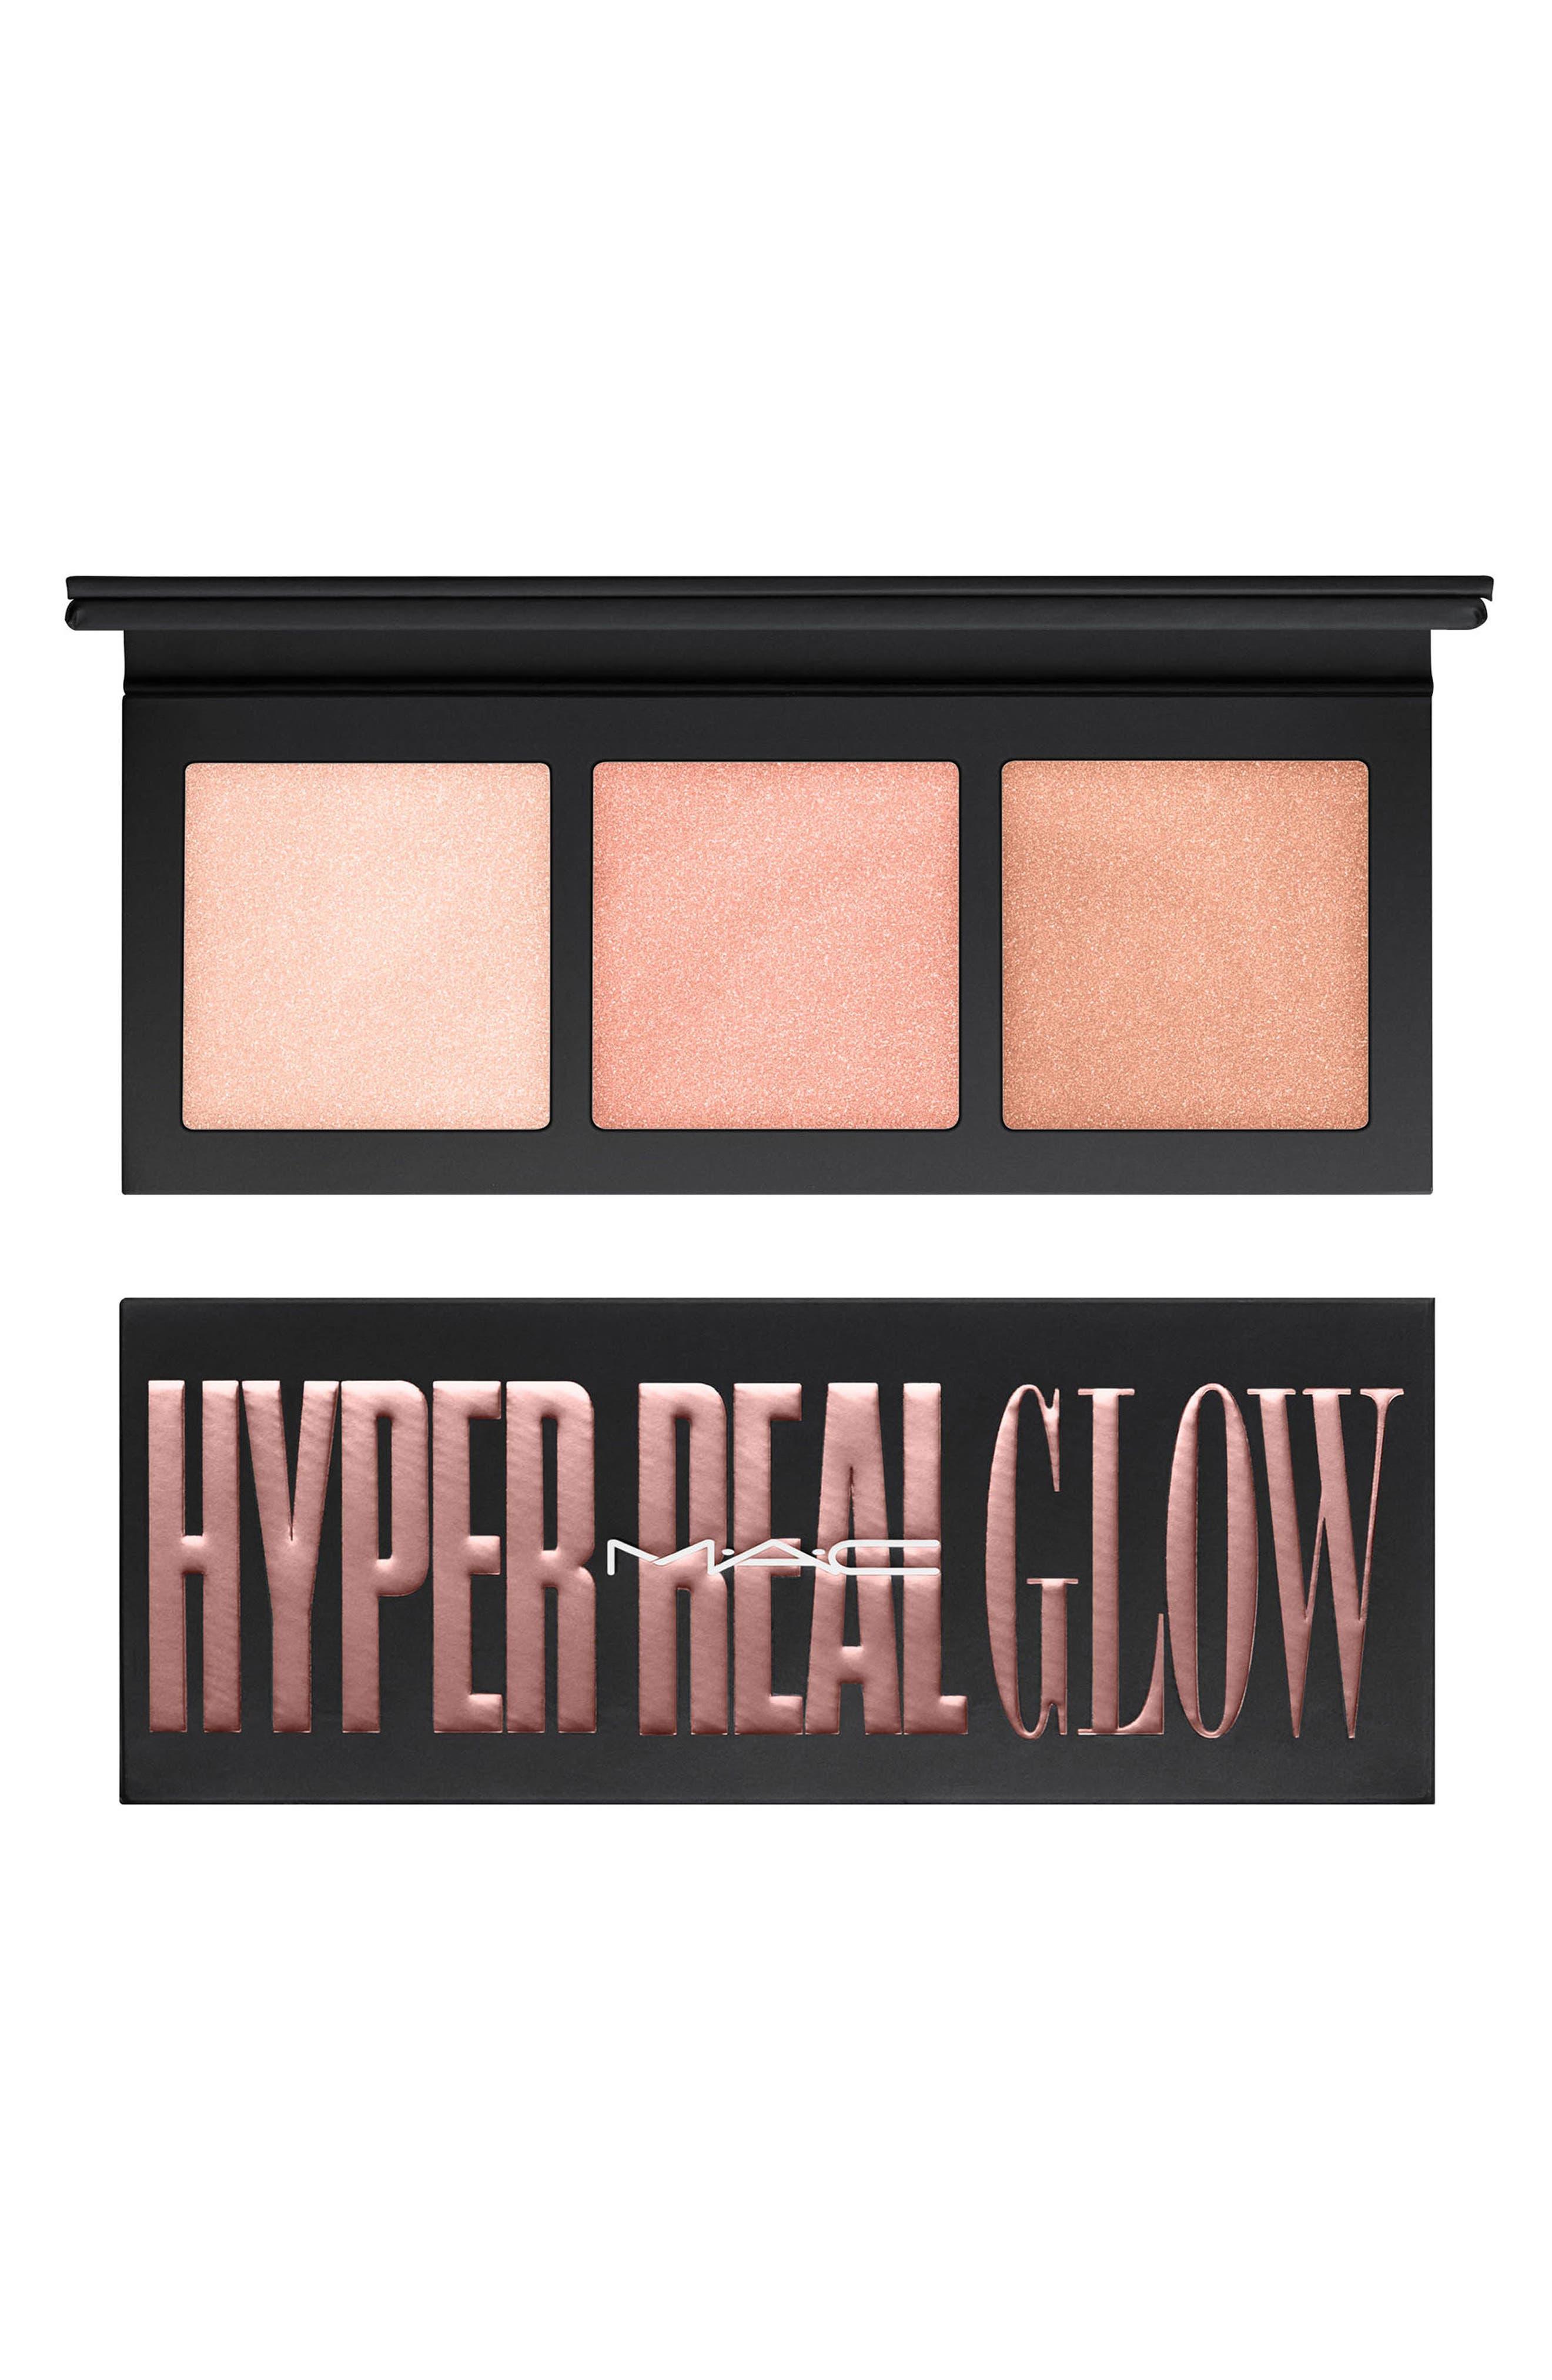 MAC Hyper Real Glow Palette,                         Main,                         color, Flash Awe